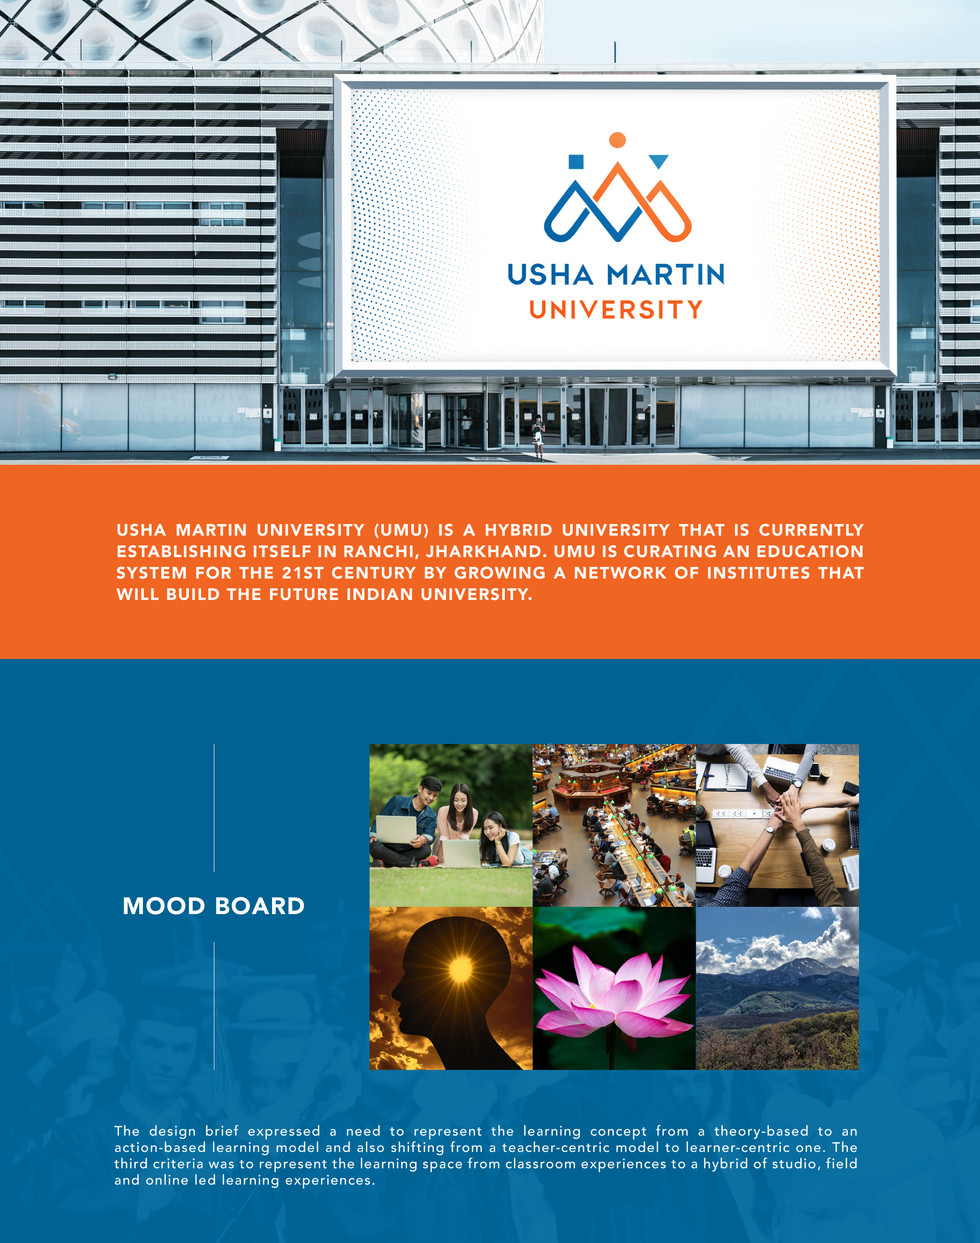 Usha-martin-university-A.jpg